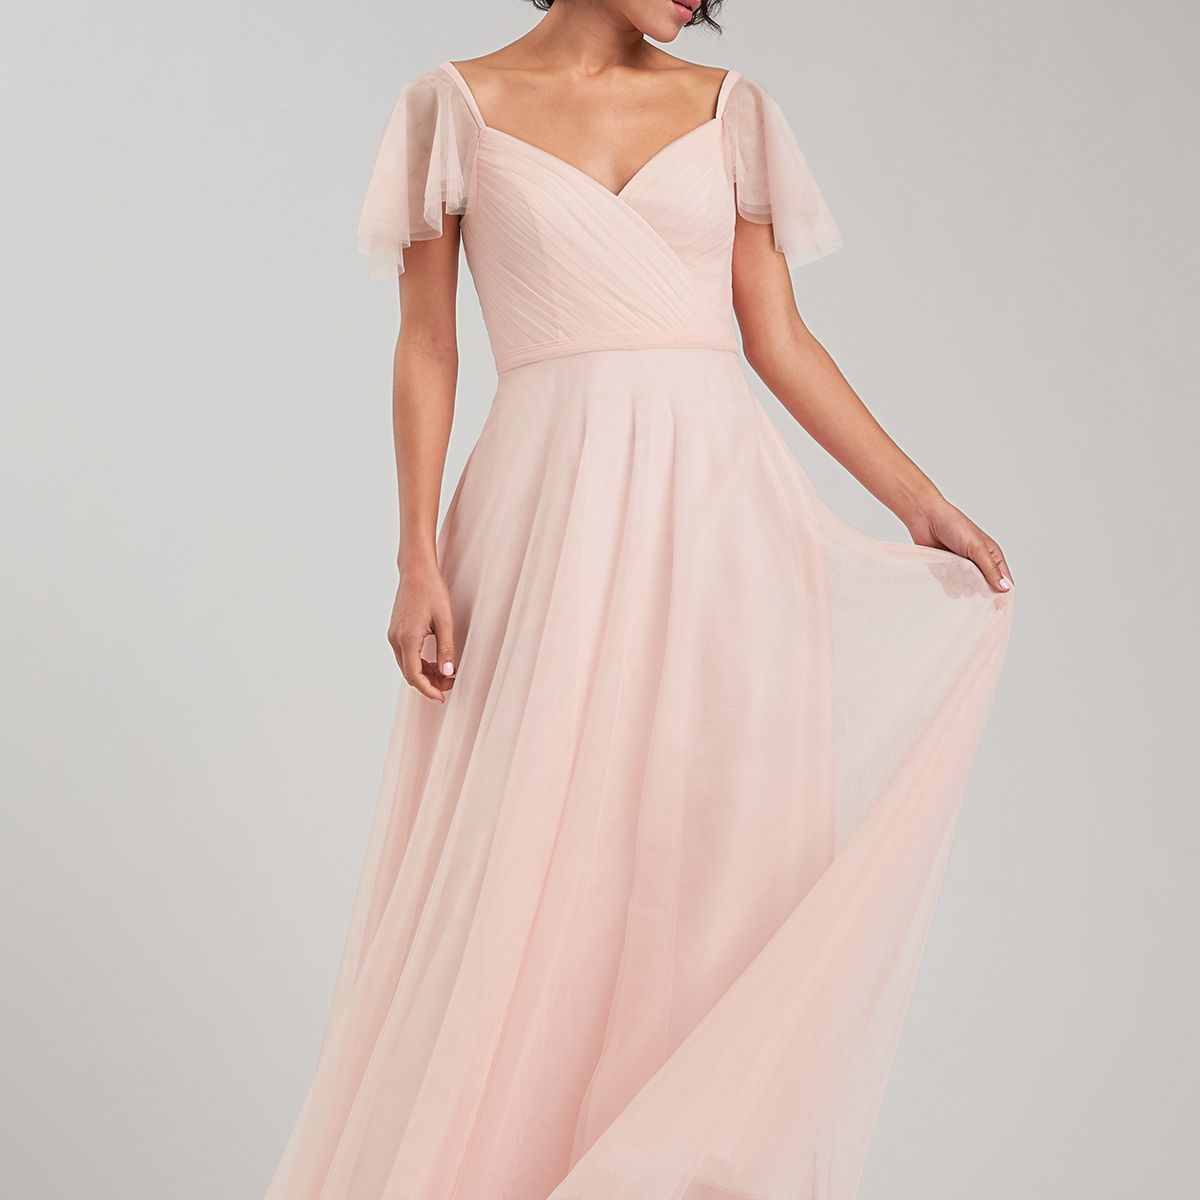 33 Summer Bridesmaid Dresses Under $200